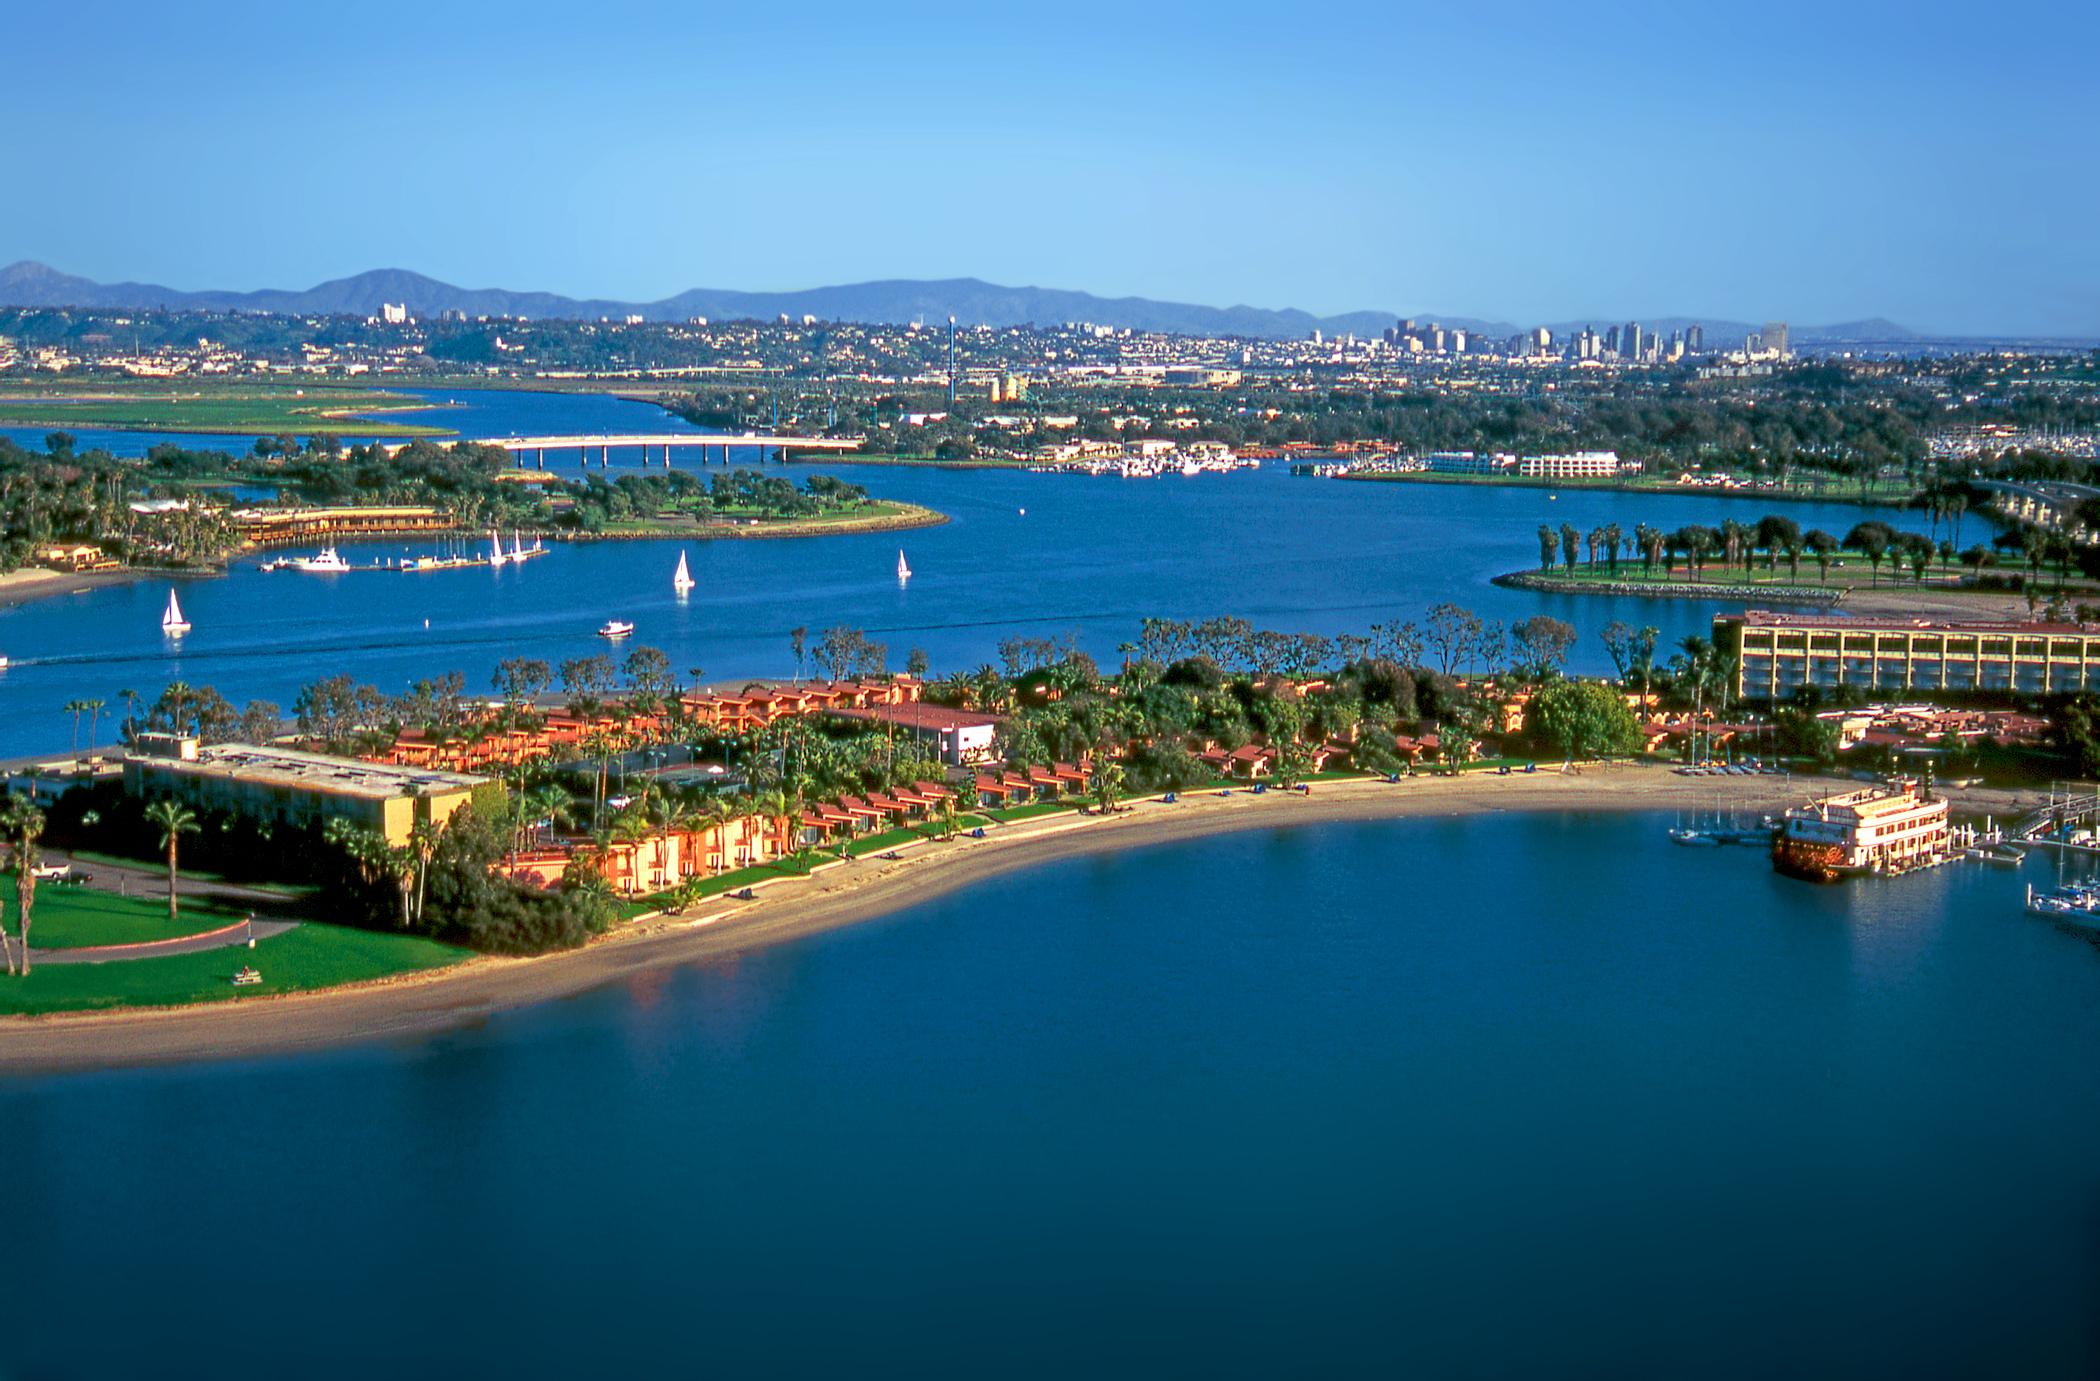 Bahia Resort Hotel San Diego Travel Blog